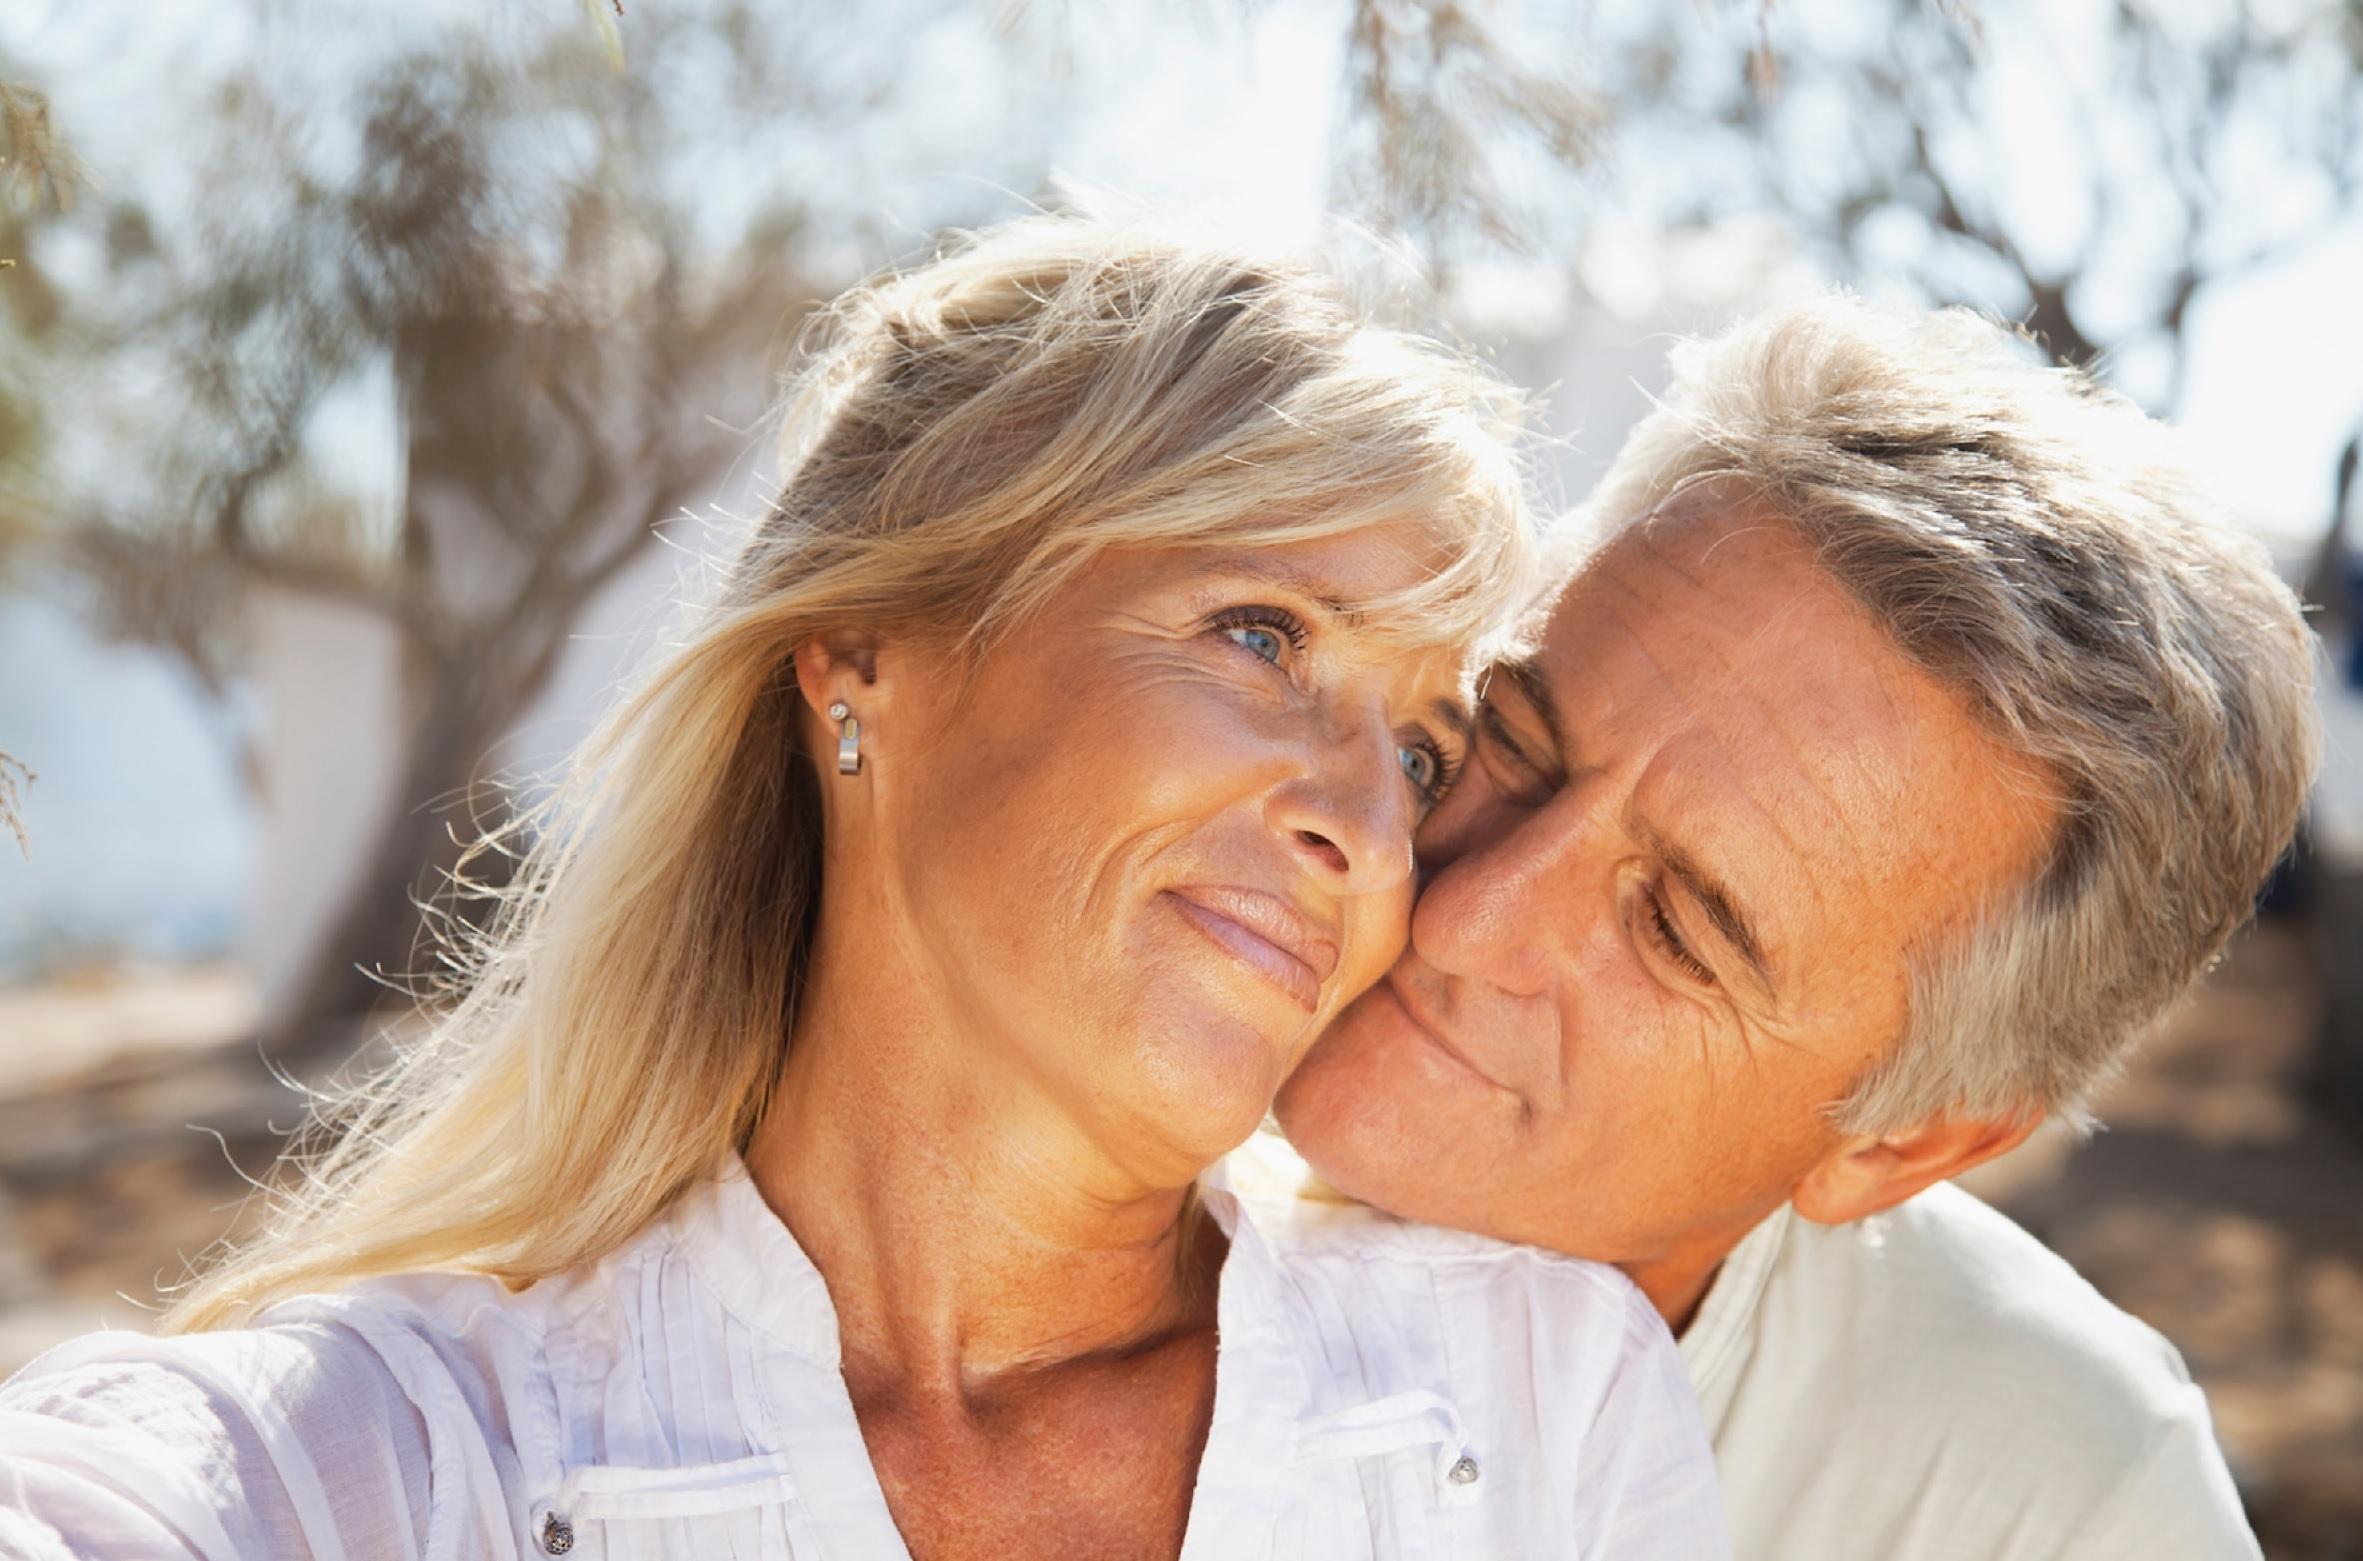 2021-04-17 Marital Fidelity